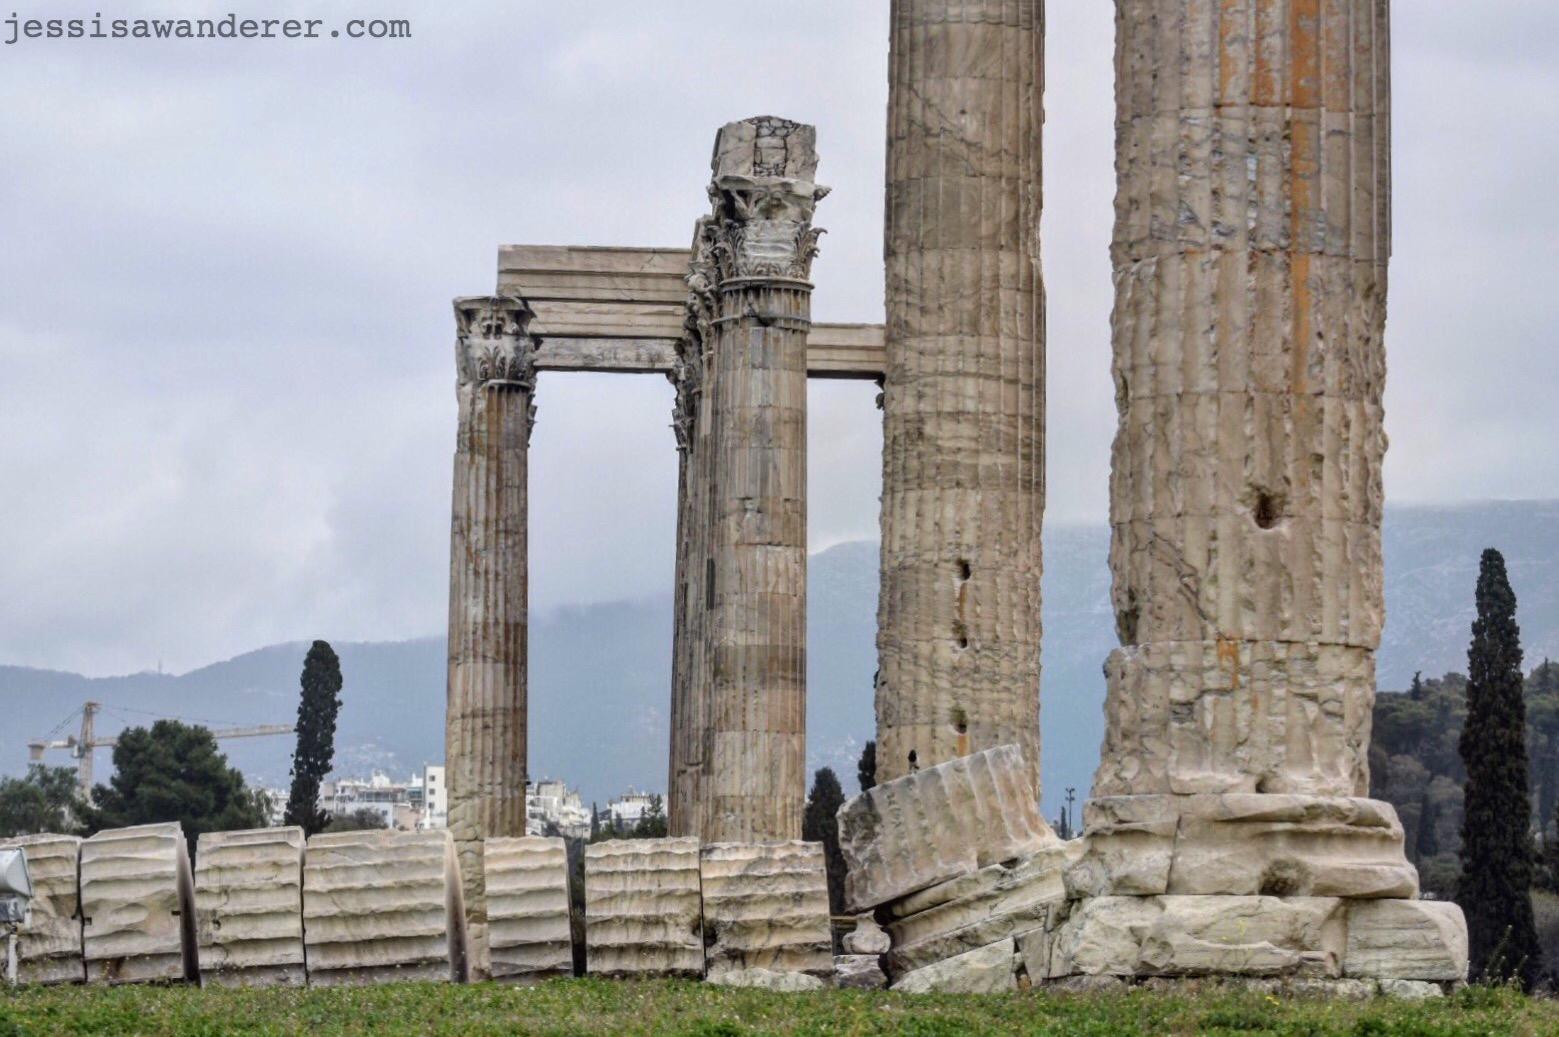 Cracked columns